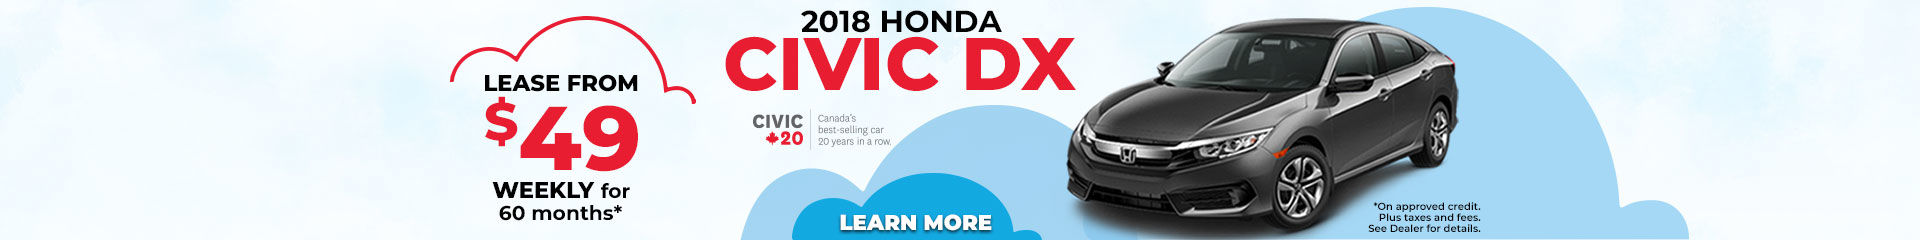 Lease the 2018 Honda Civic DX